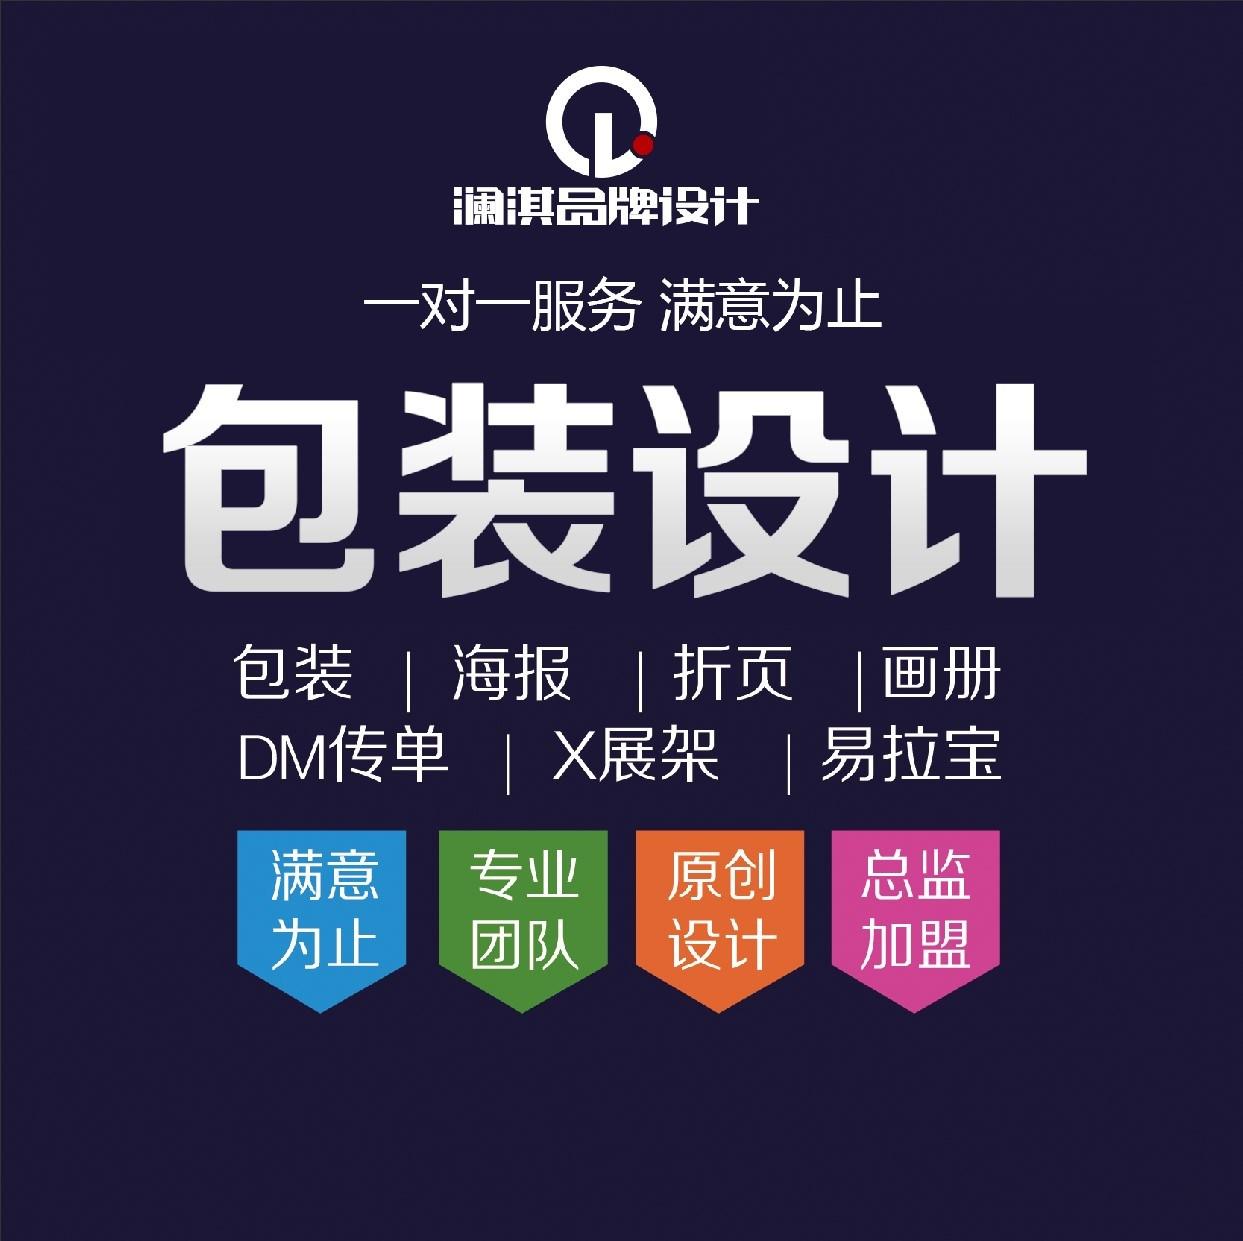 ps平面包装广告DM单logo彩页画册排版宣传单宣传册易拉宝海报设计